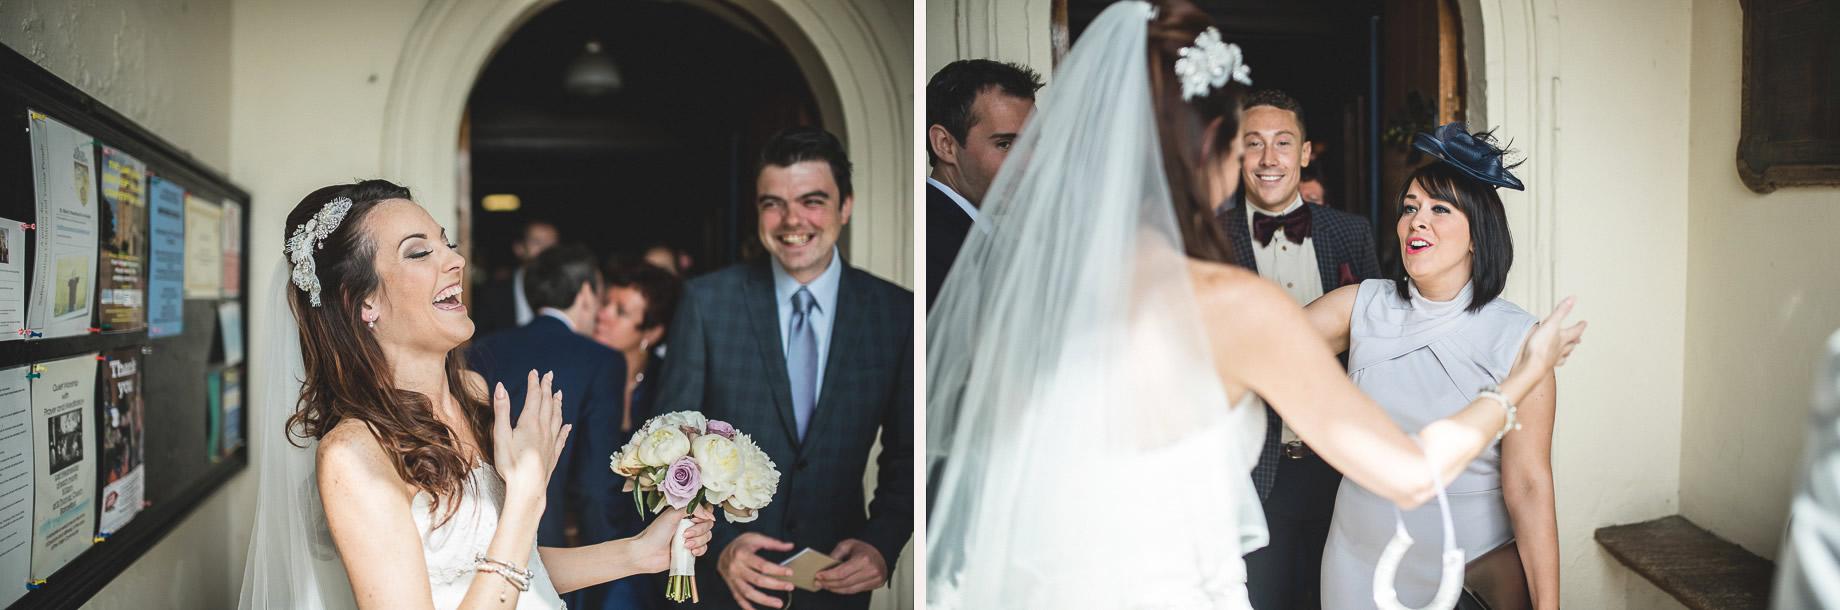 Helen and Matt's Wedding at Mitton Hall 052